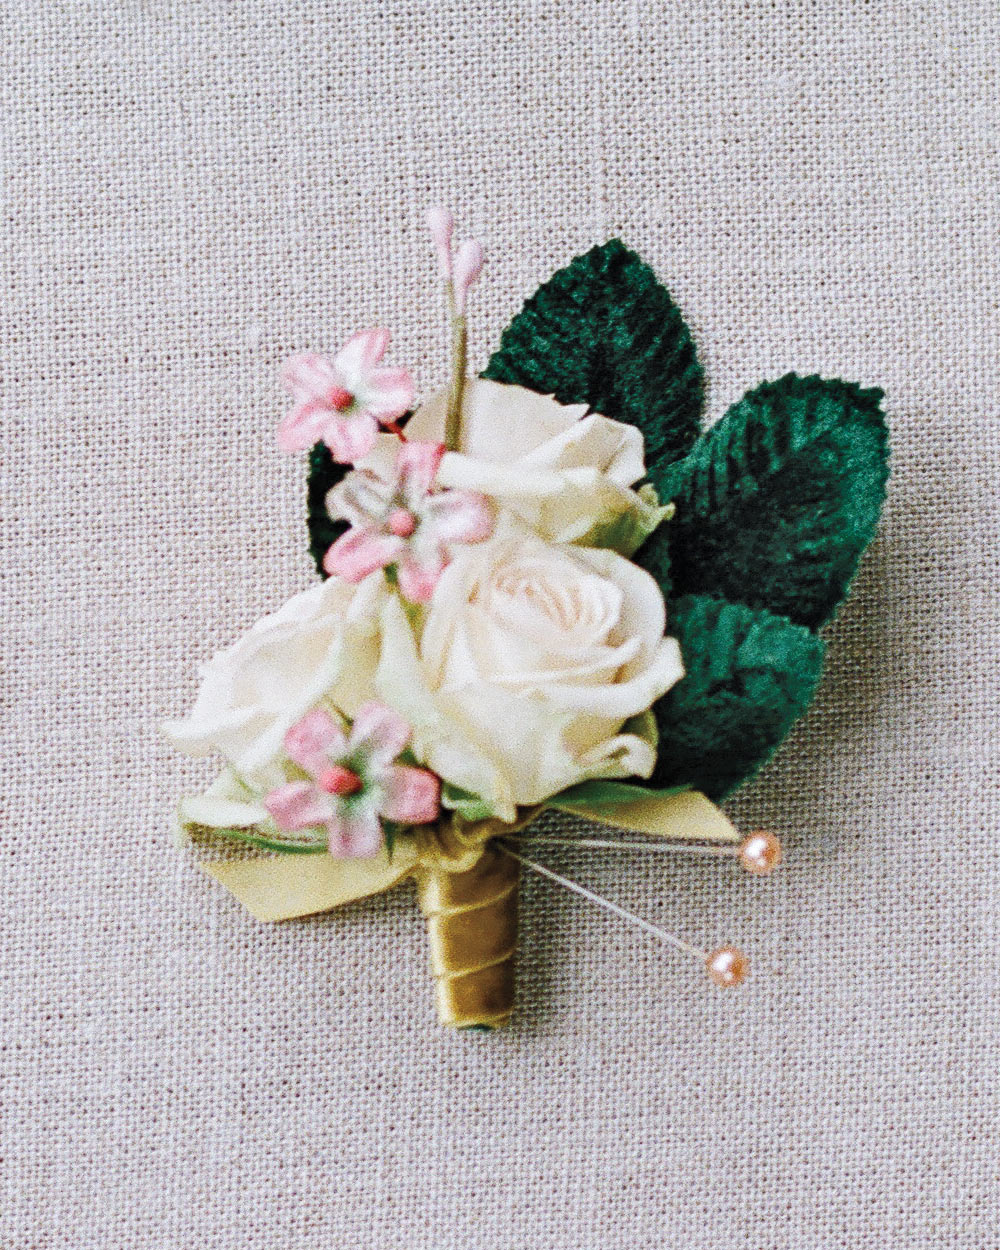 adrienne-jason-wedding-minnesota-boutonnieres-0292-s111925.jpg